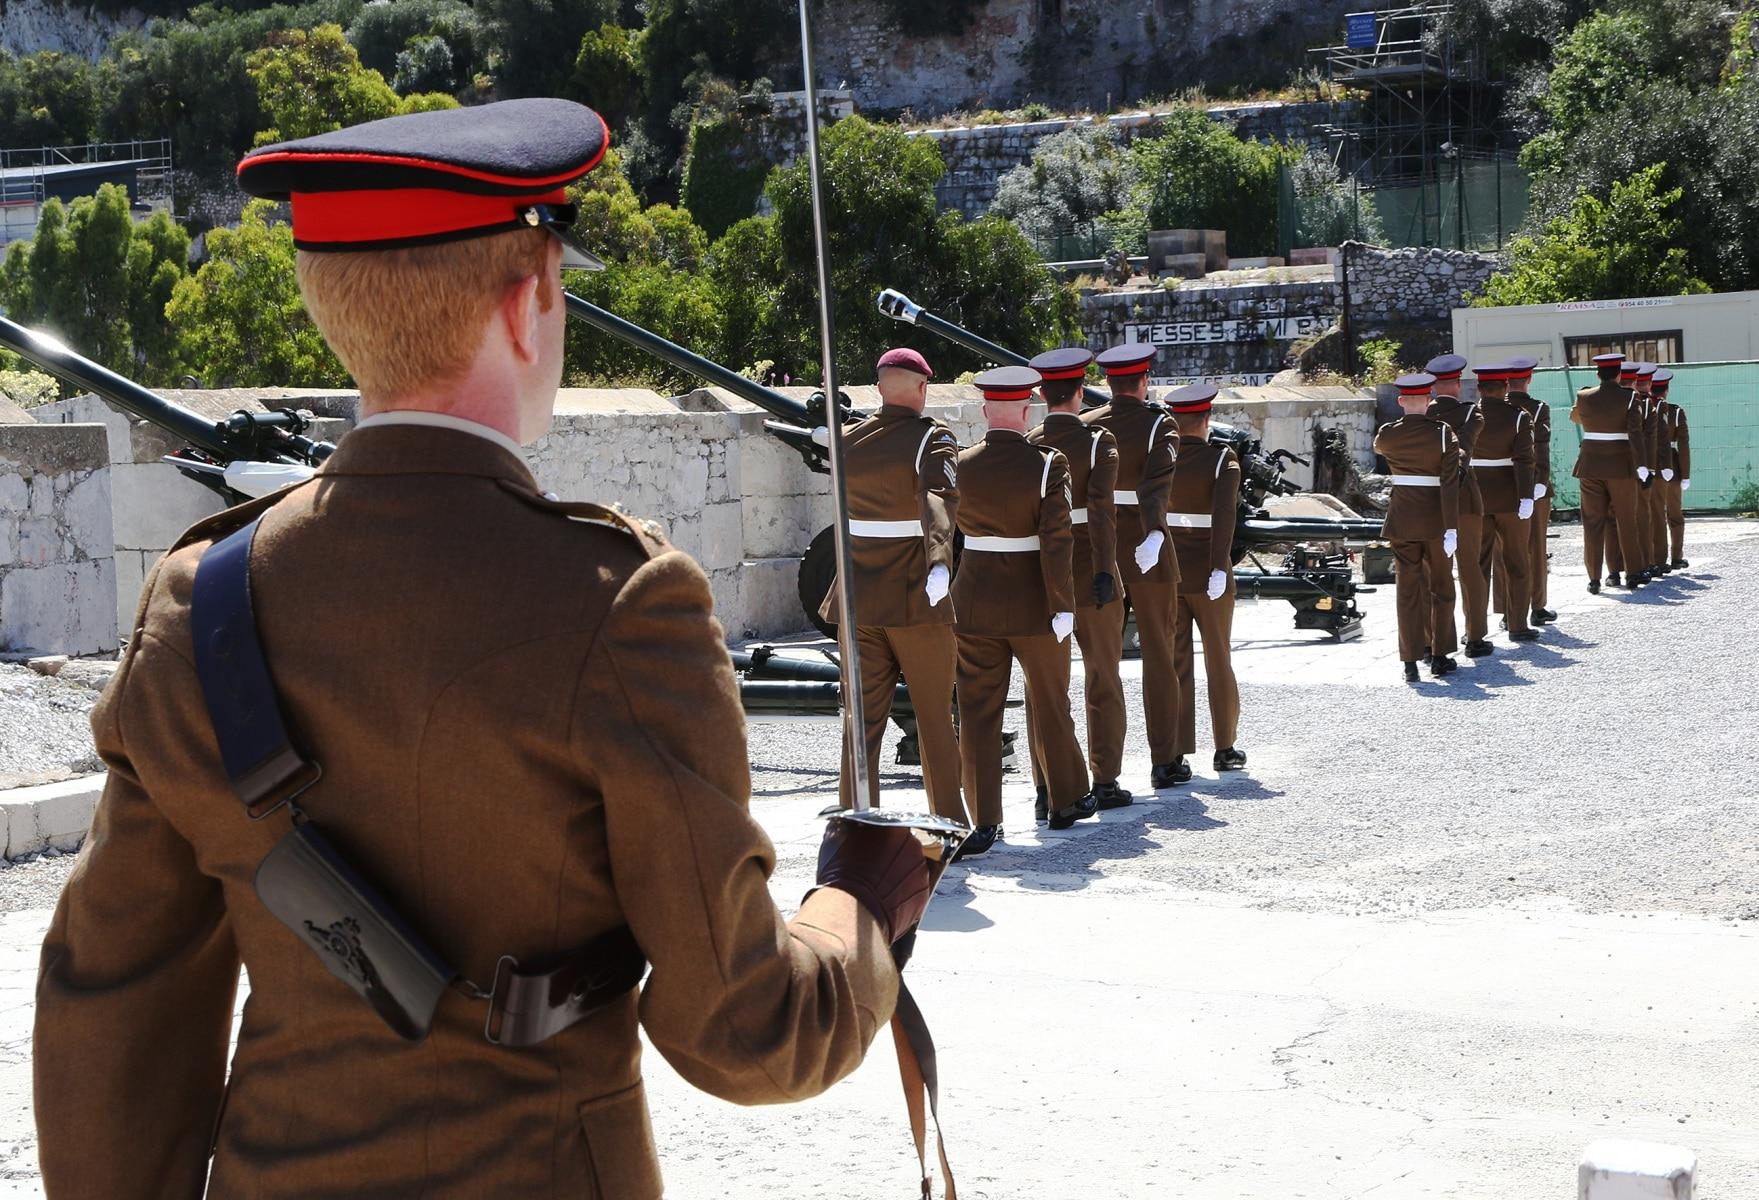 2-jun-2016-salvas-en-gibraltar-honor-al-aniversario-de-coronacin-de-la-reina_27417187335_o